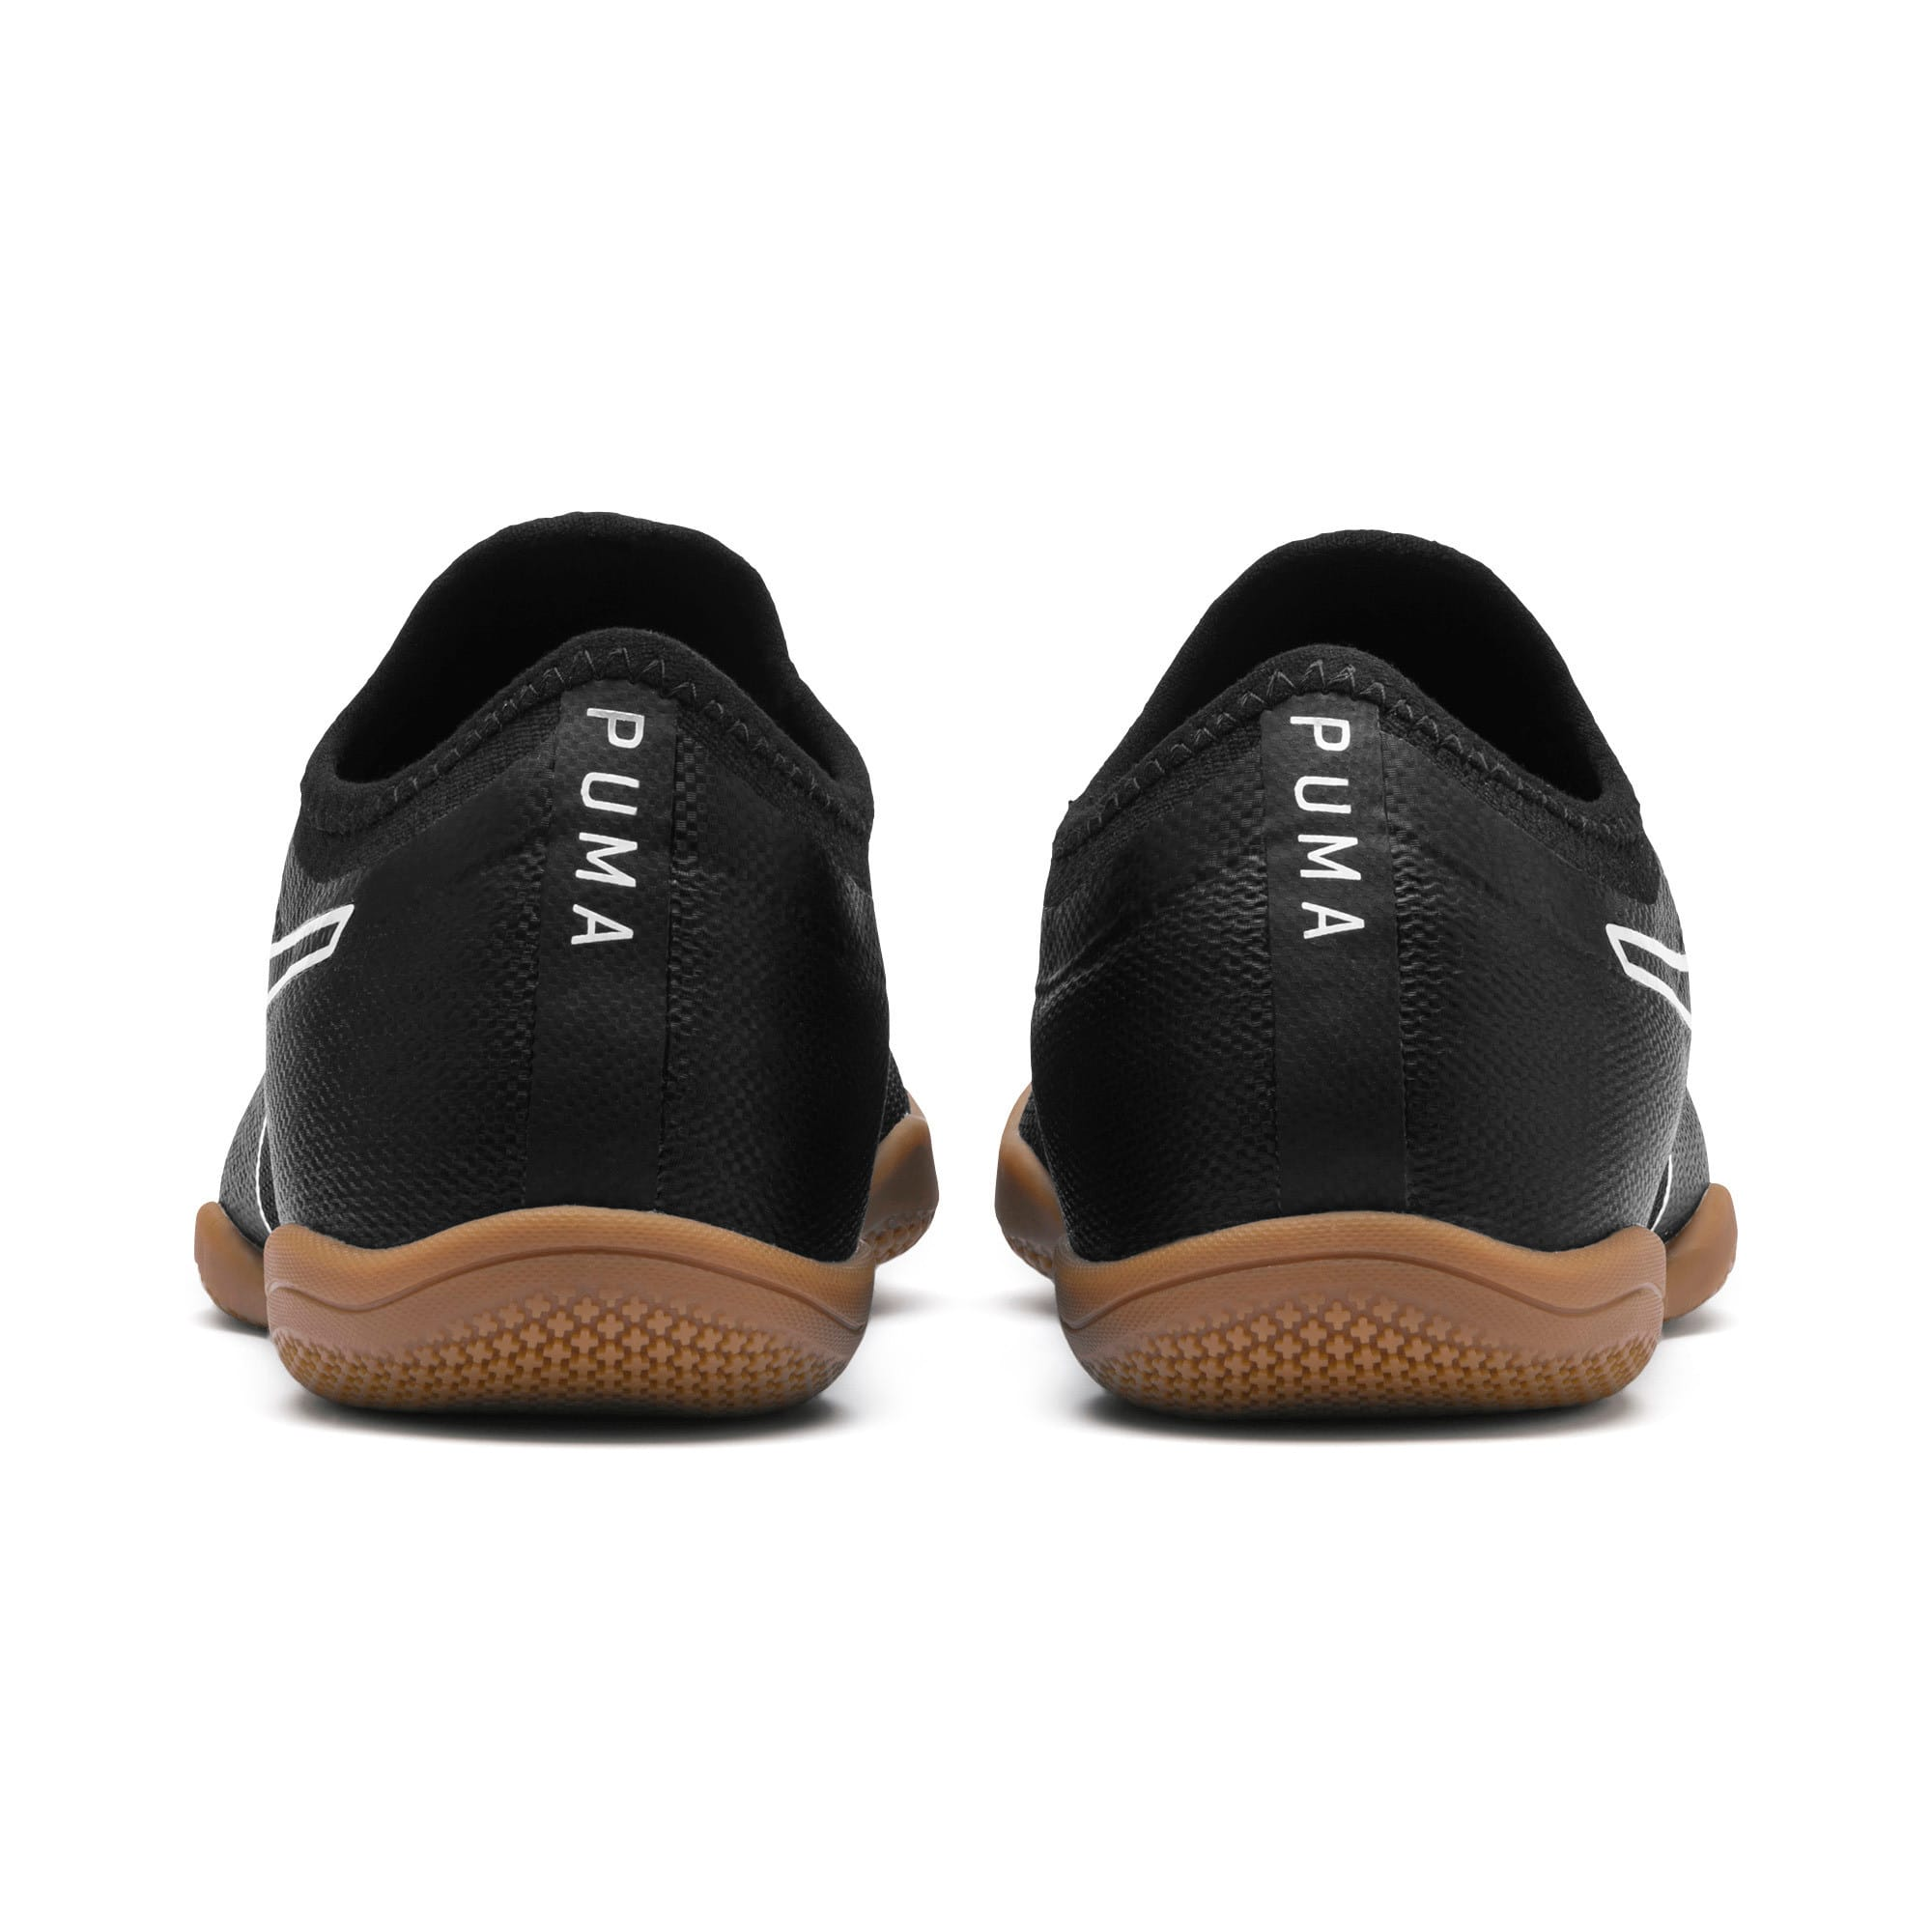 Thumbnail 4 of 365 Sala 1 Men's Football Boots, Puma Black-Puma White-Gum, medium